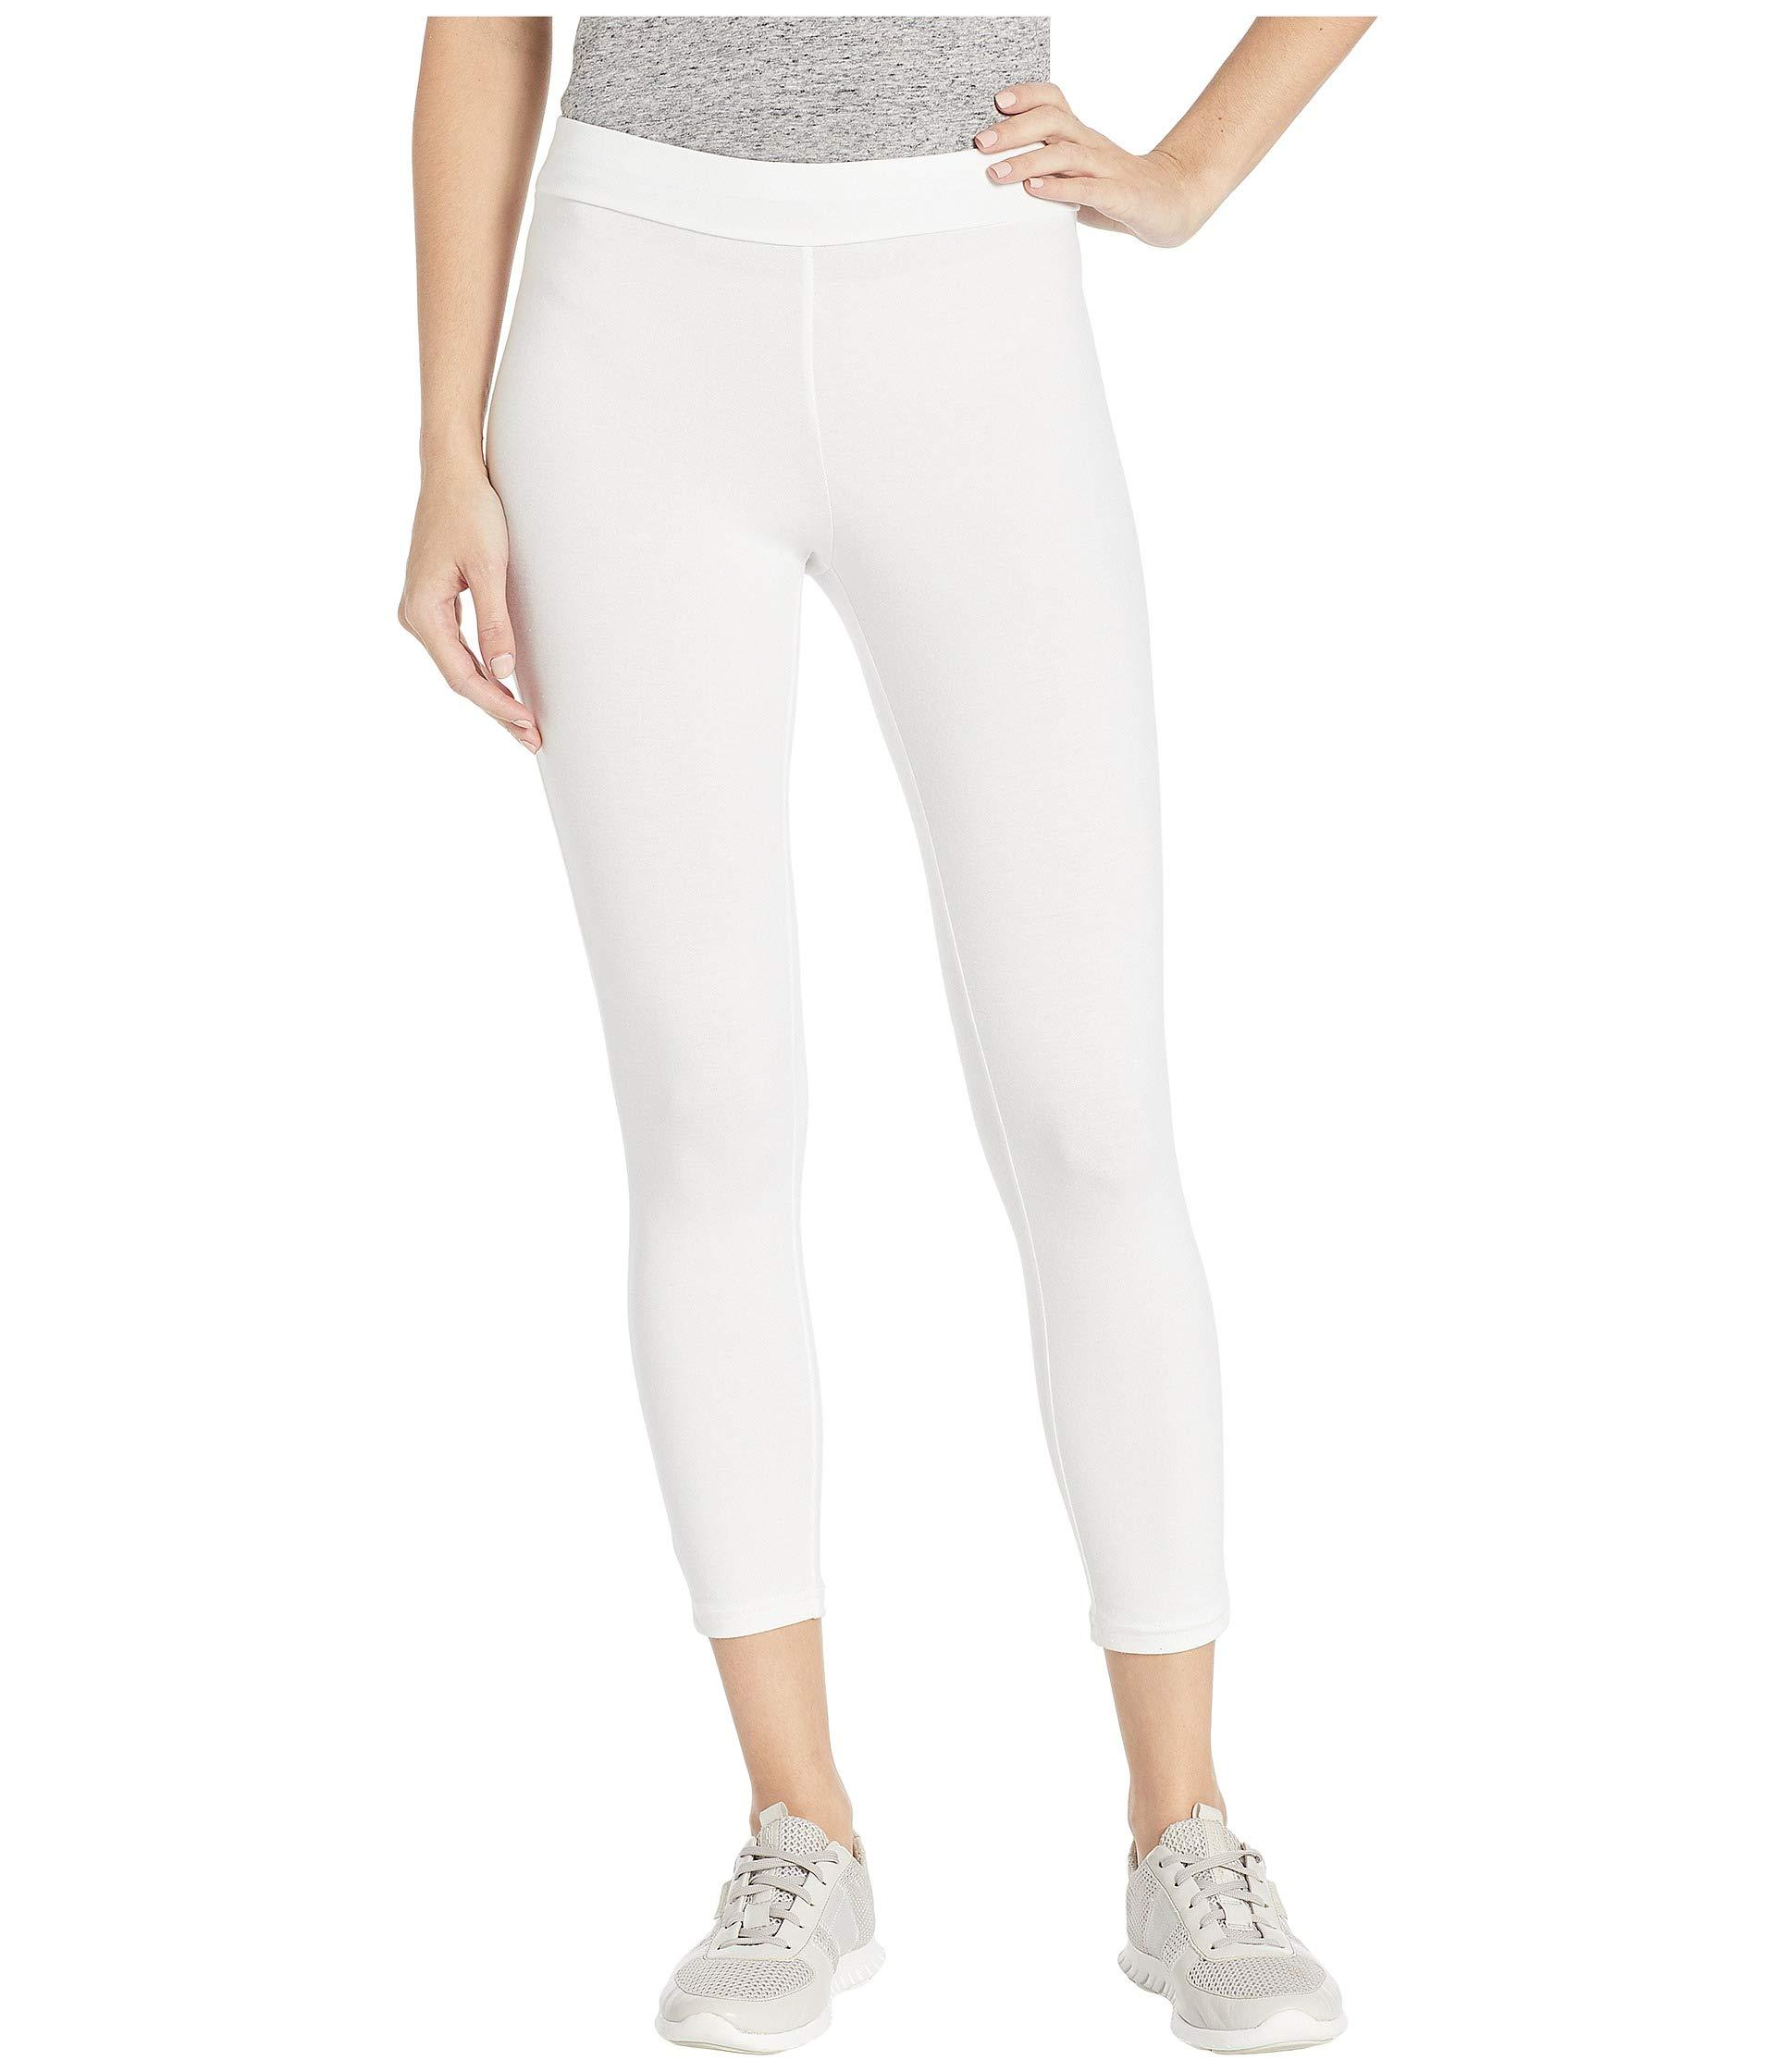 648fe3c9b01 Hue. White Wide Waistband Blackout Cotton Capri Leggings (black) Women s  Casual Pants